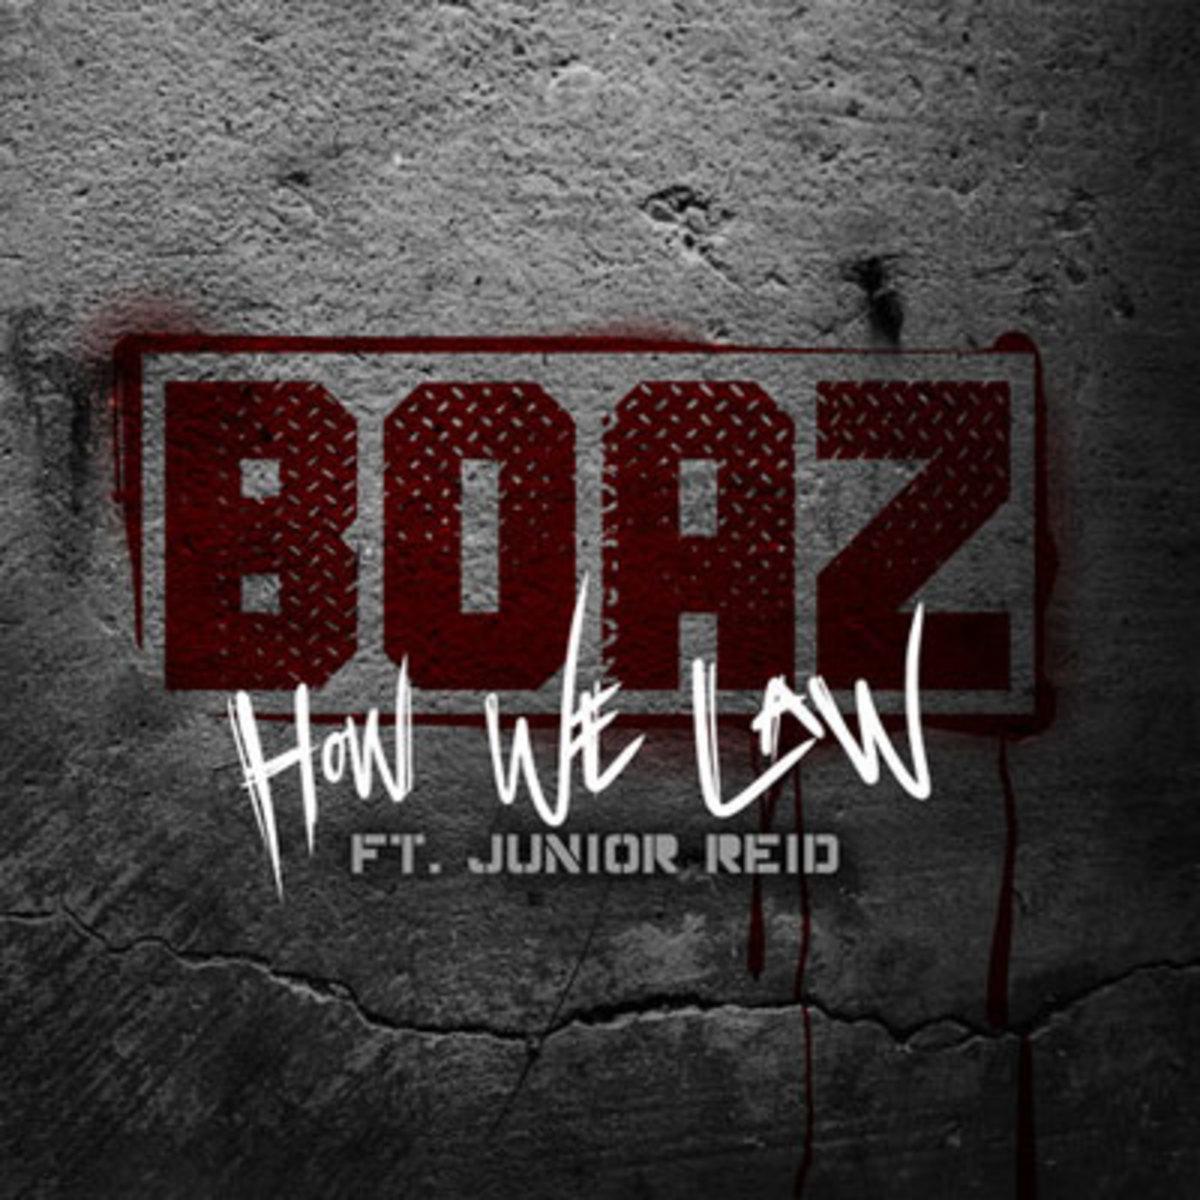 boaz-howwelaw.jpg